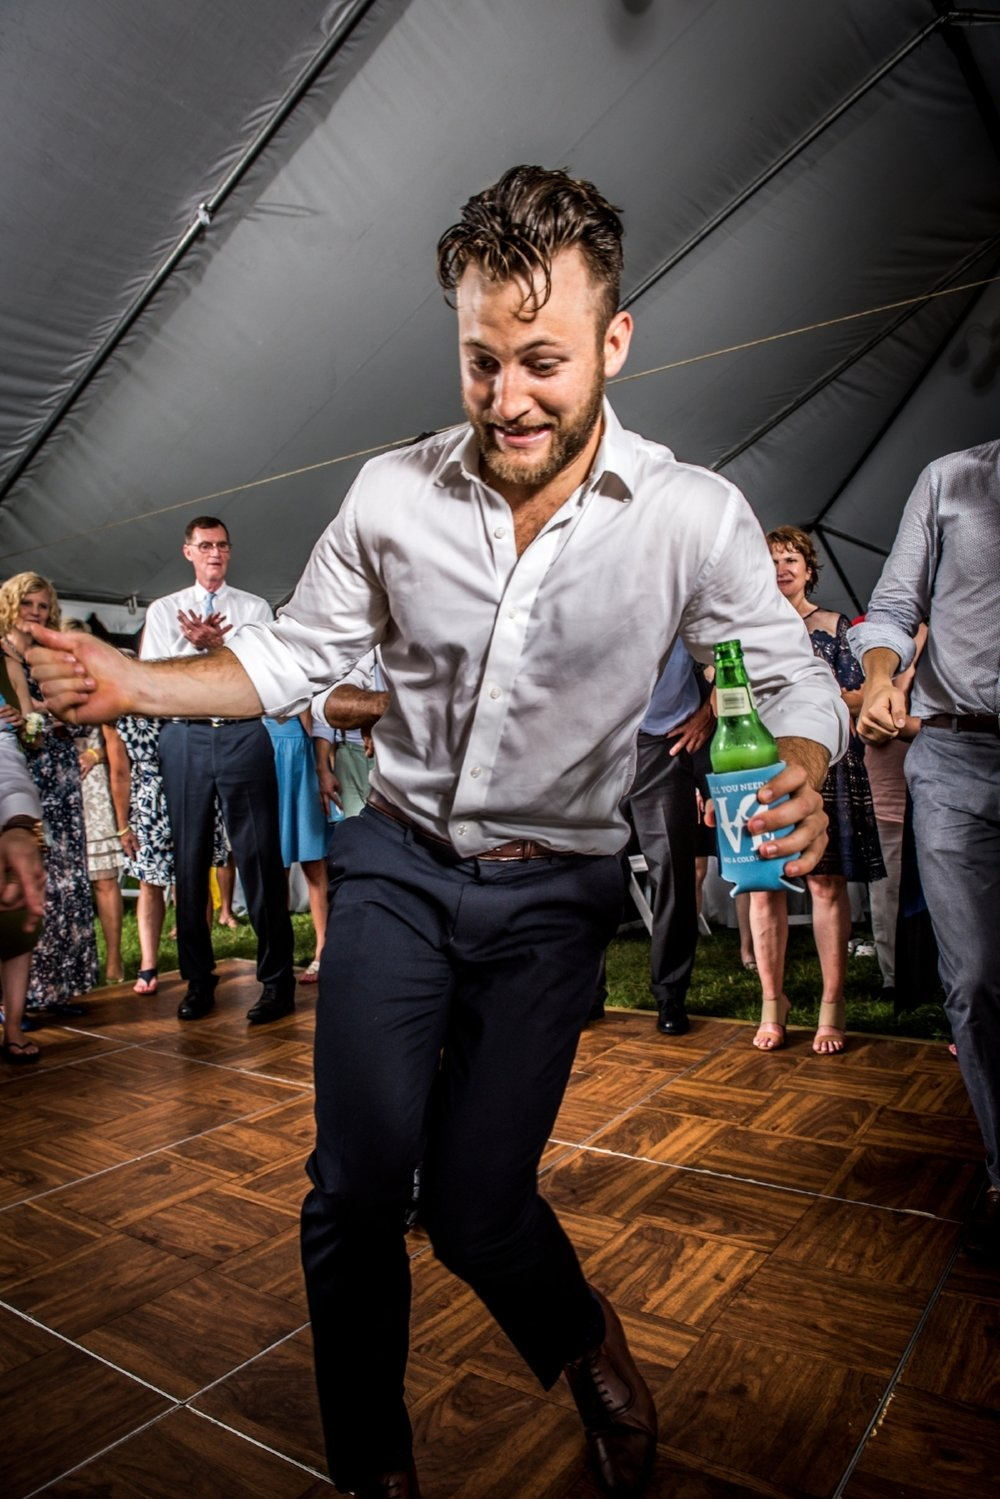 groomsmen-dancing-at-wedding-reception